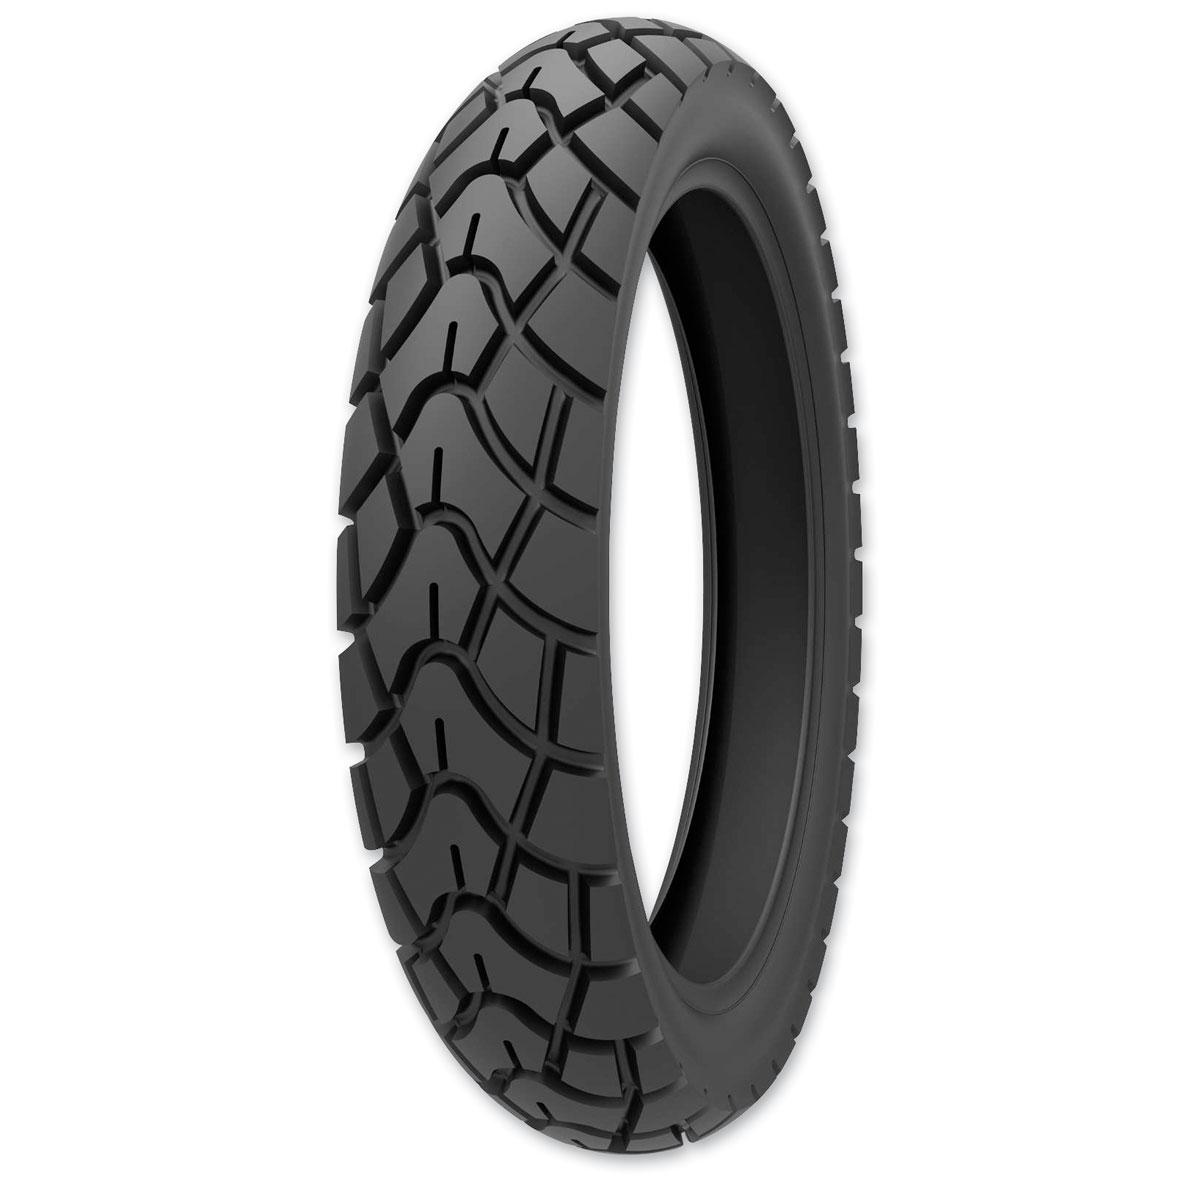 Kenda Tires K761 120/90-10 Front/Rear Tire